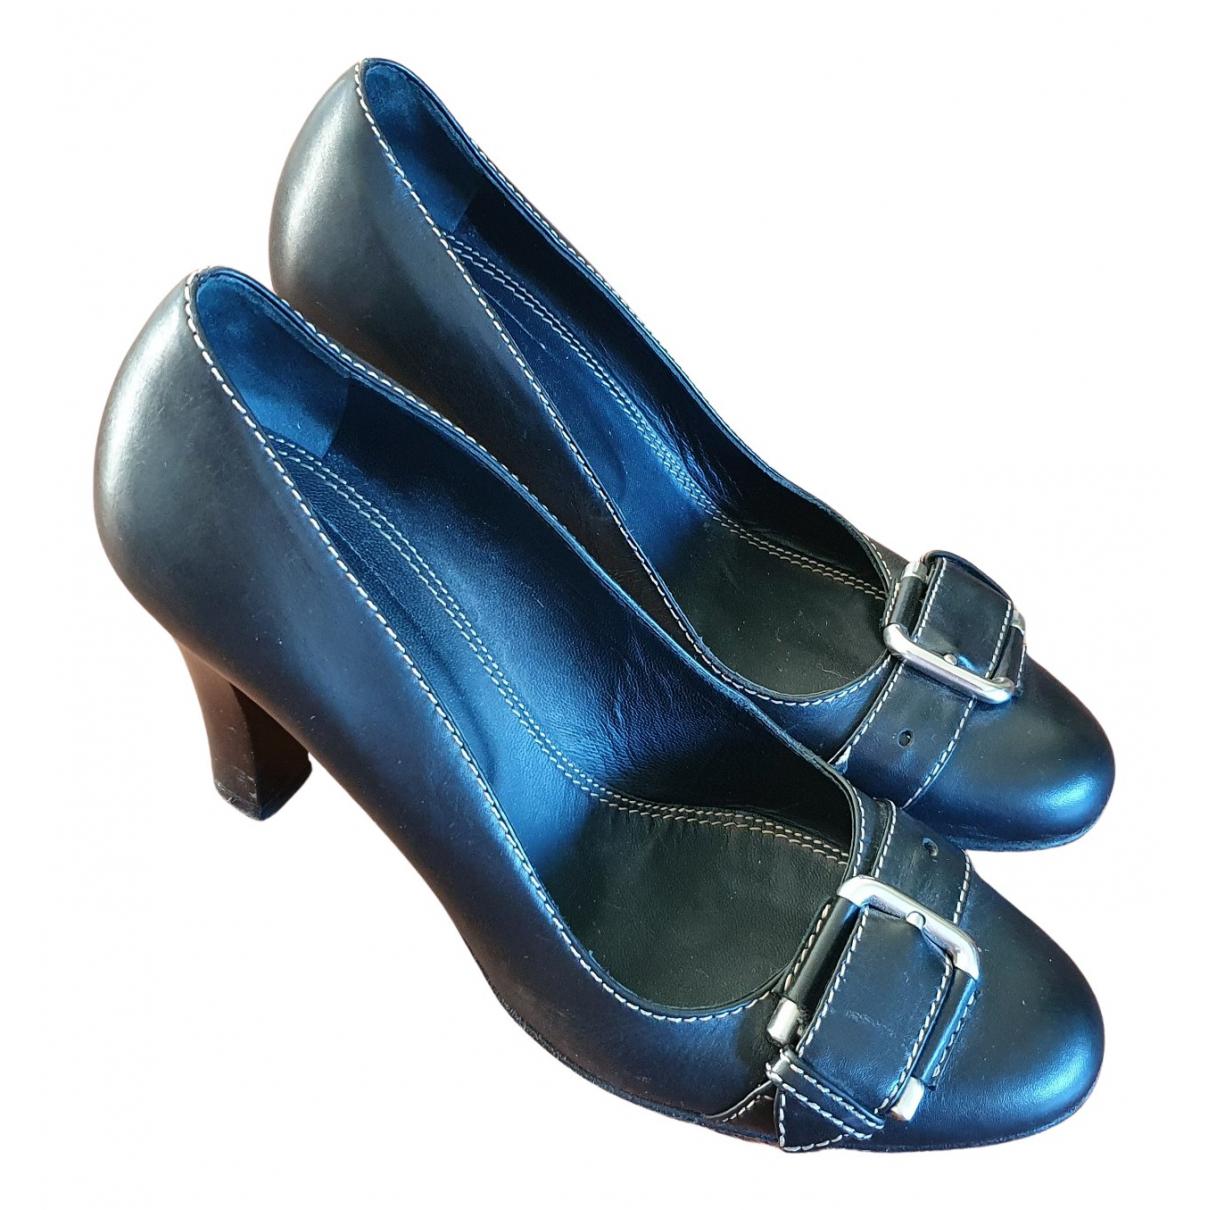 Bally N Black Leather Heels for Women 38 EU